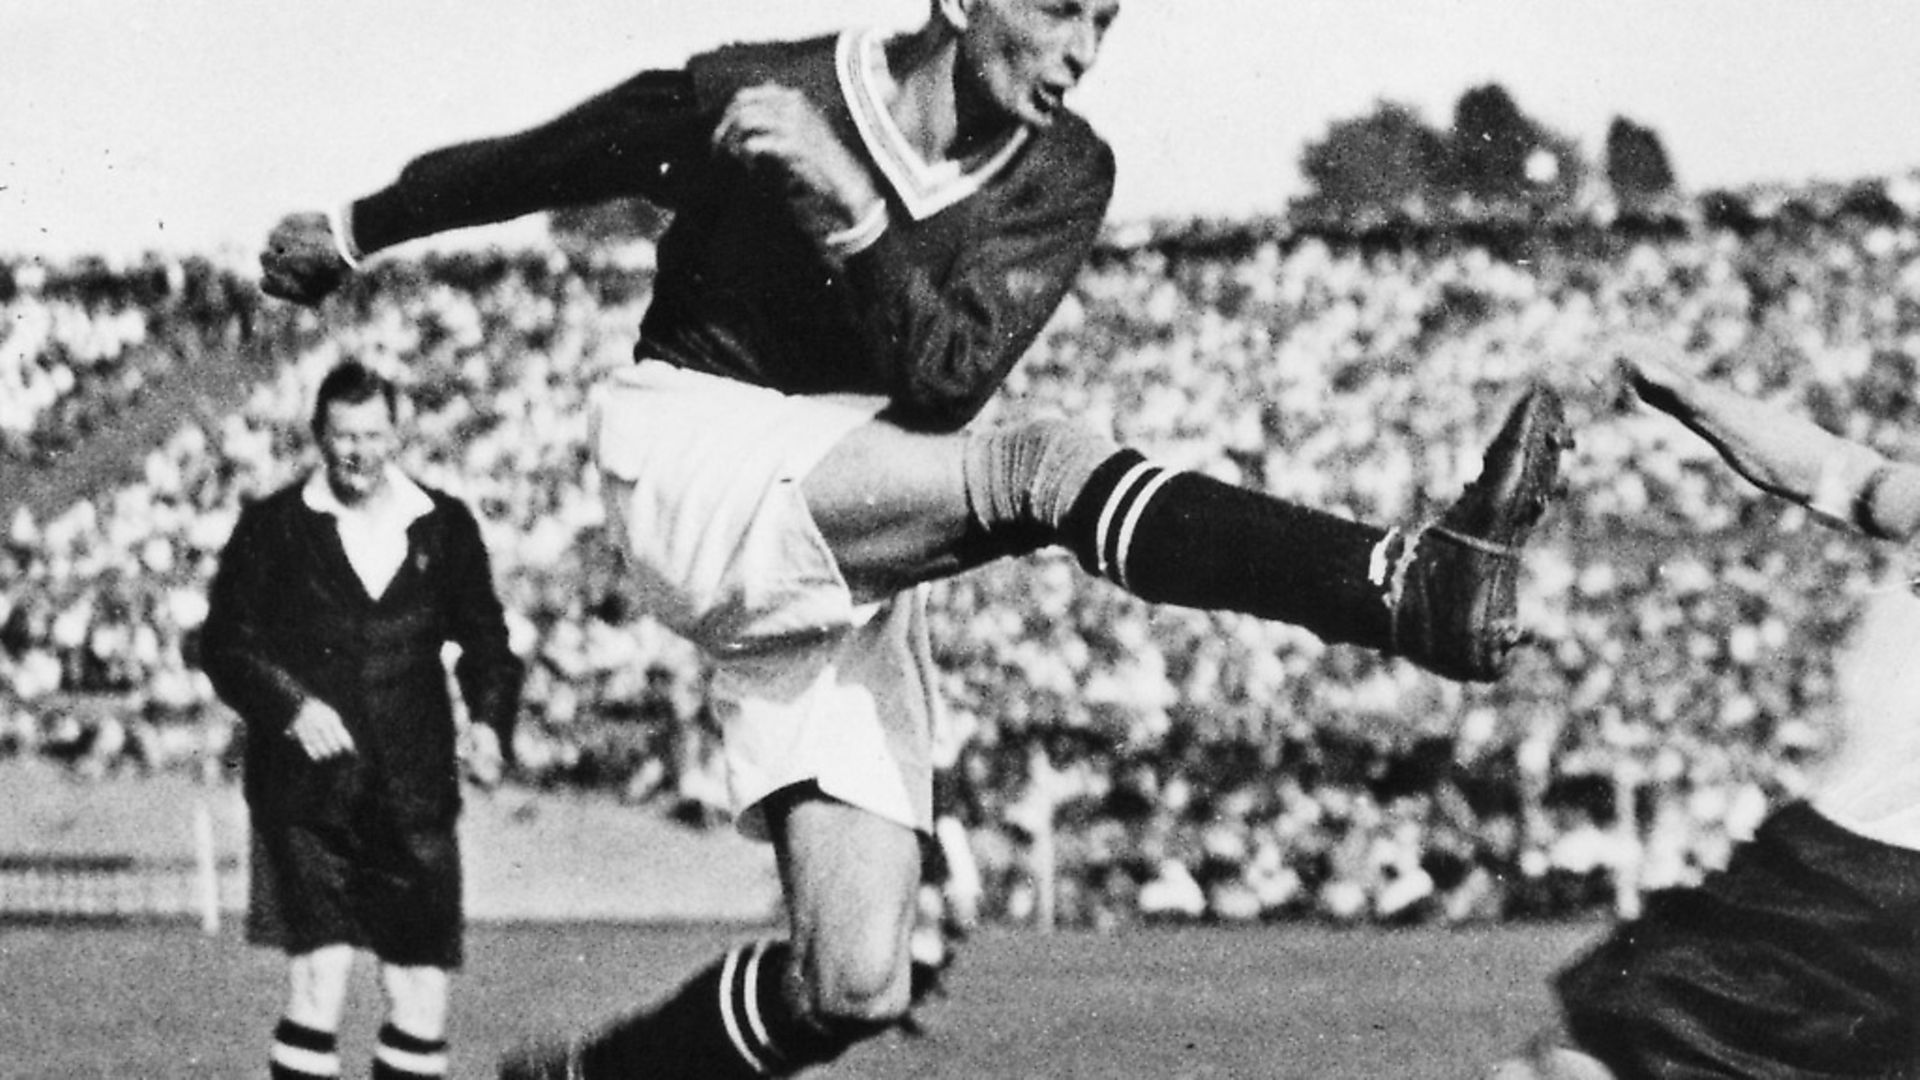 Wunderteam: Matthias Sindelar in action in Austria's 6-0 victory over Germany in Berlin in 1931. Photo: ullstein bild via Getty Images - Credit: ullstein bild via Getty Images